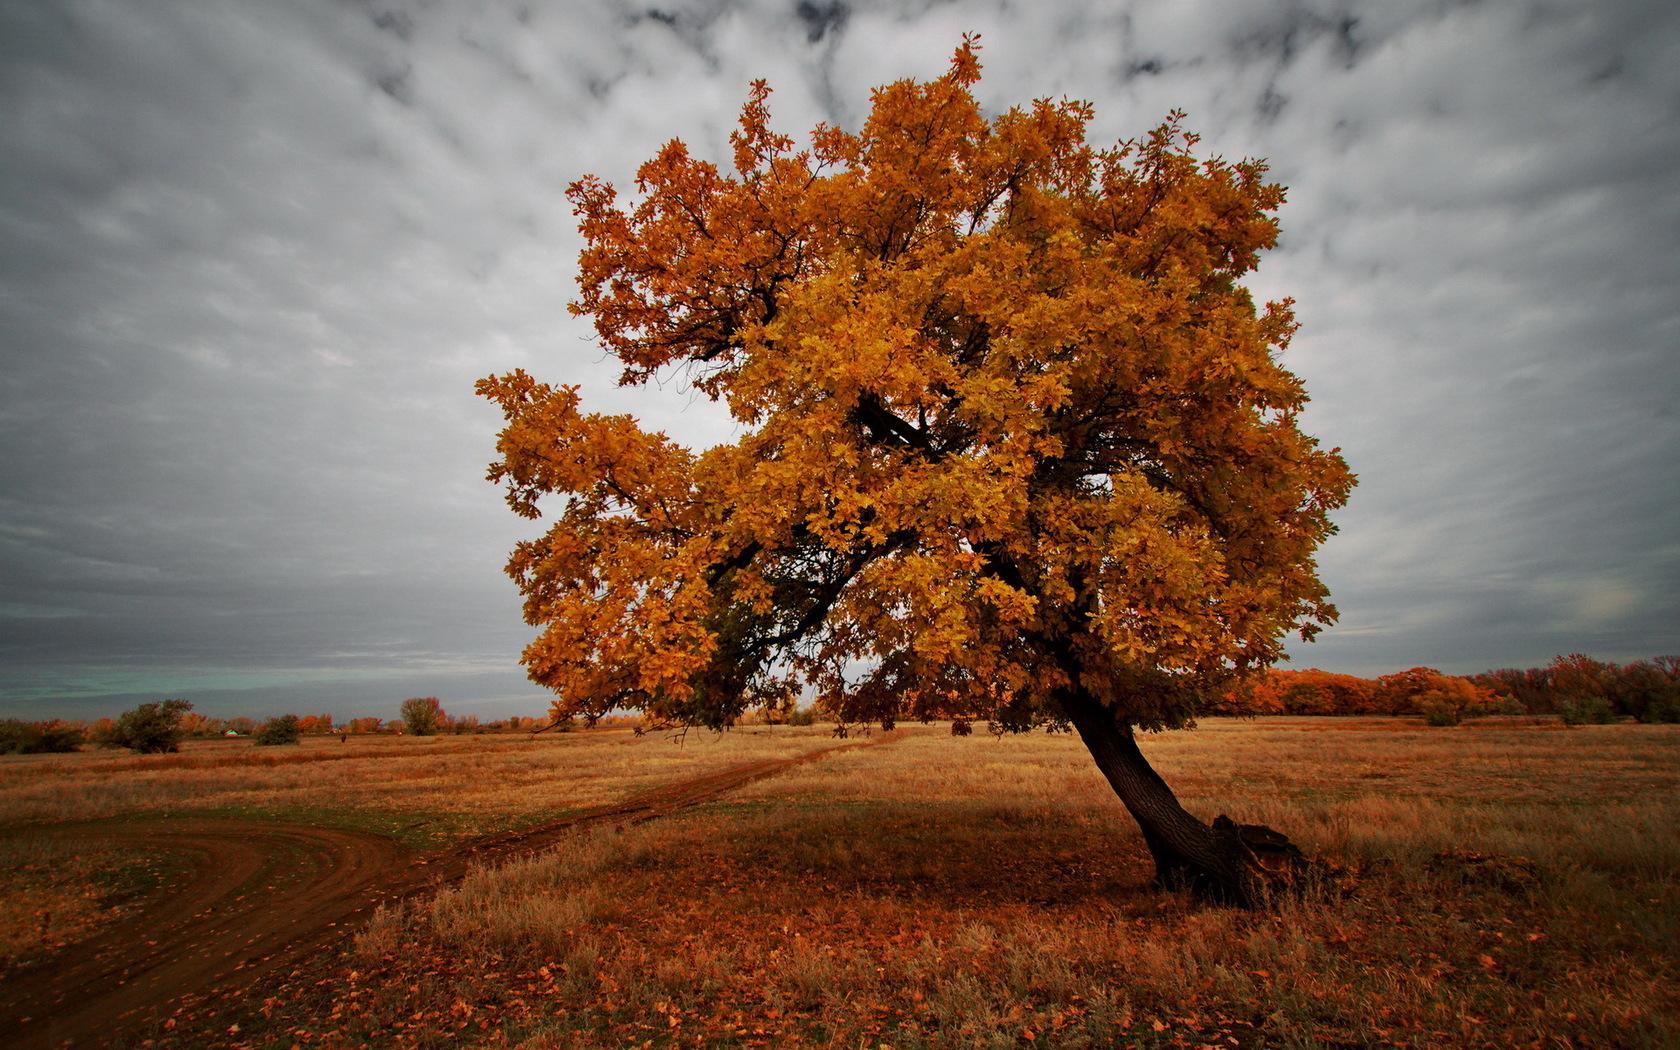 field in autumn tree